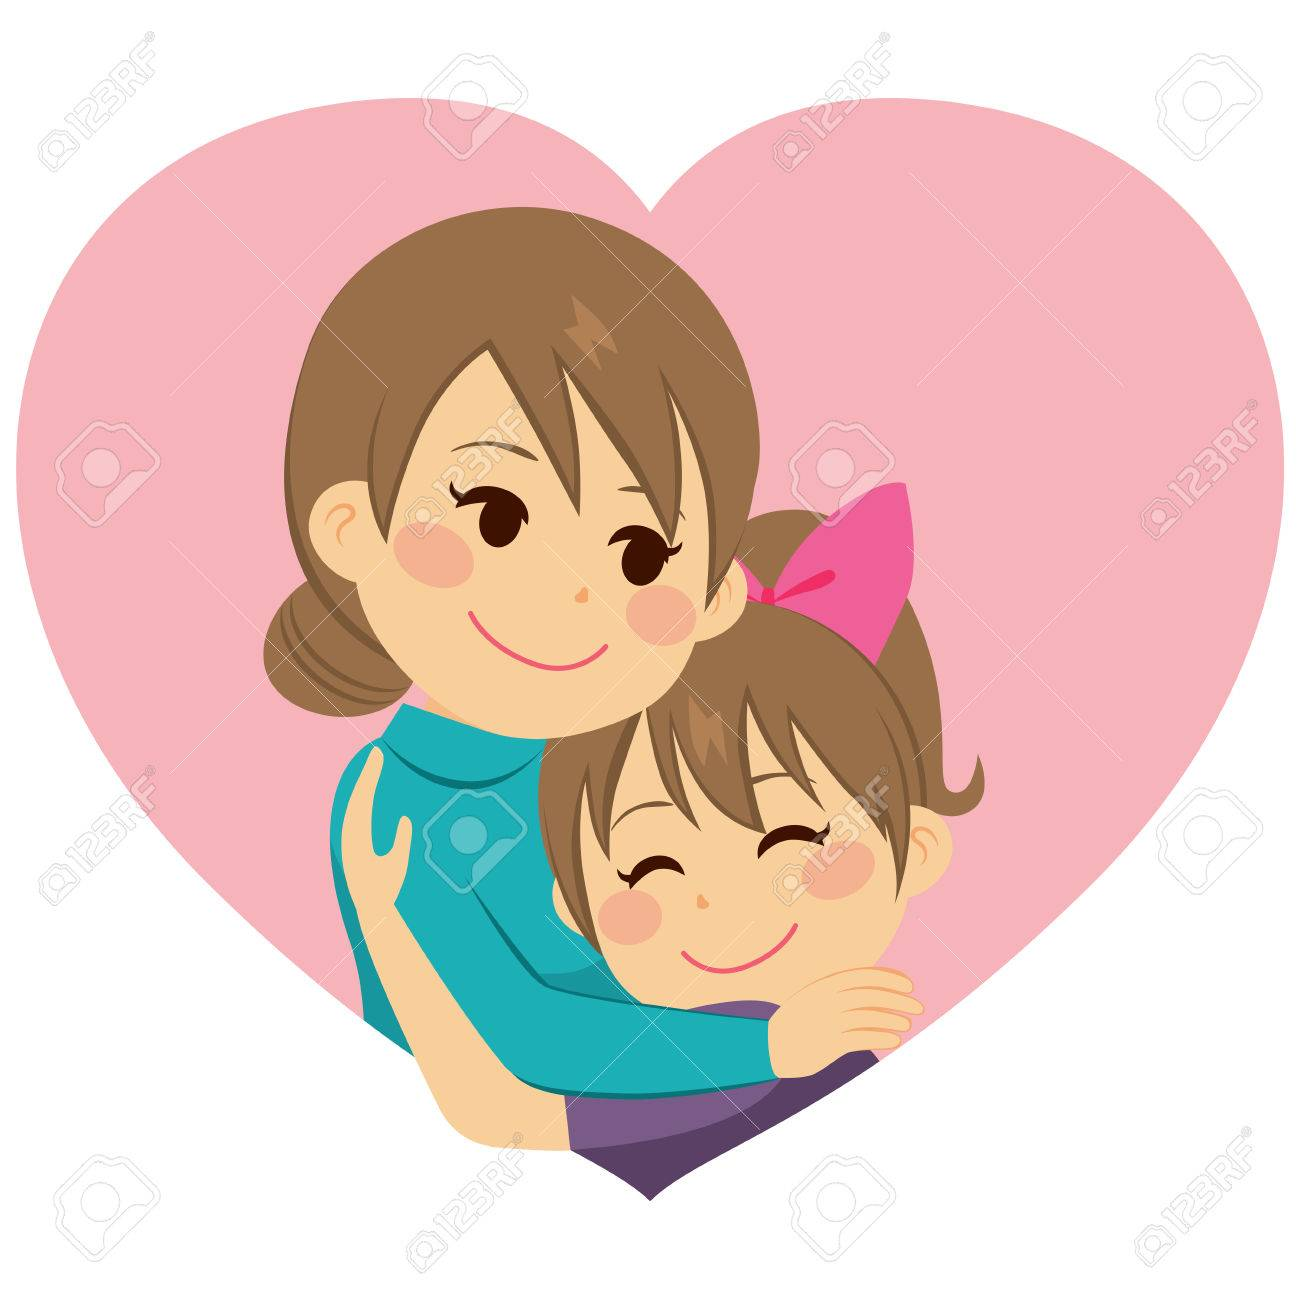 Cute little girl daughter hugging mom celebrating Mother's Day.